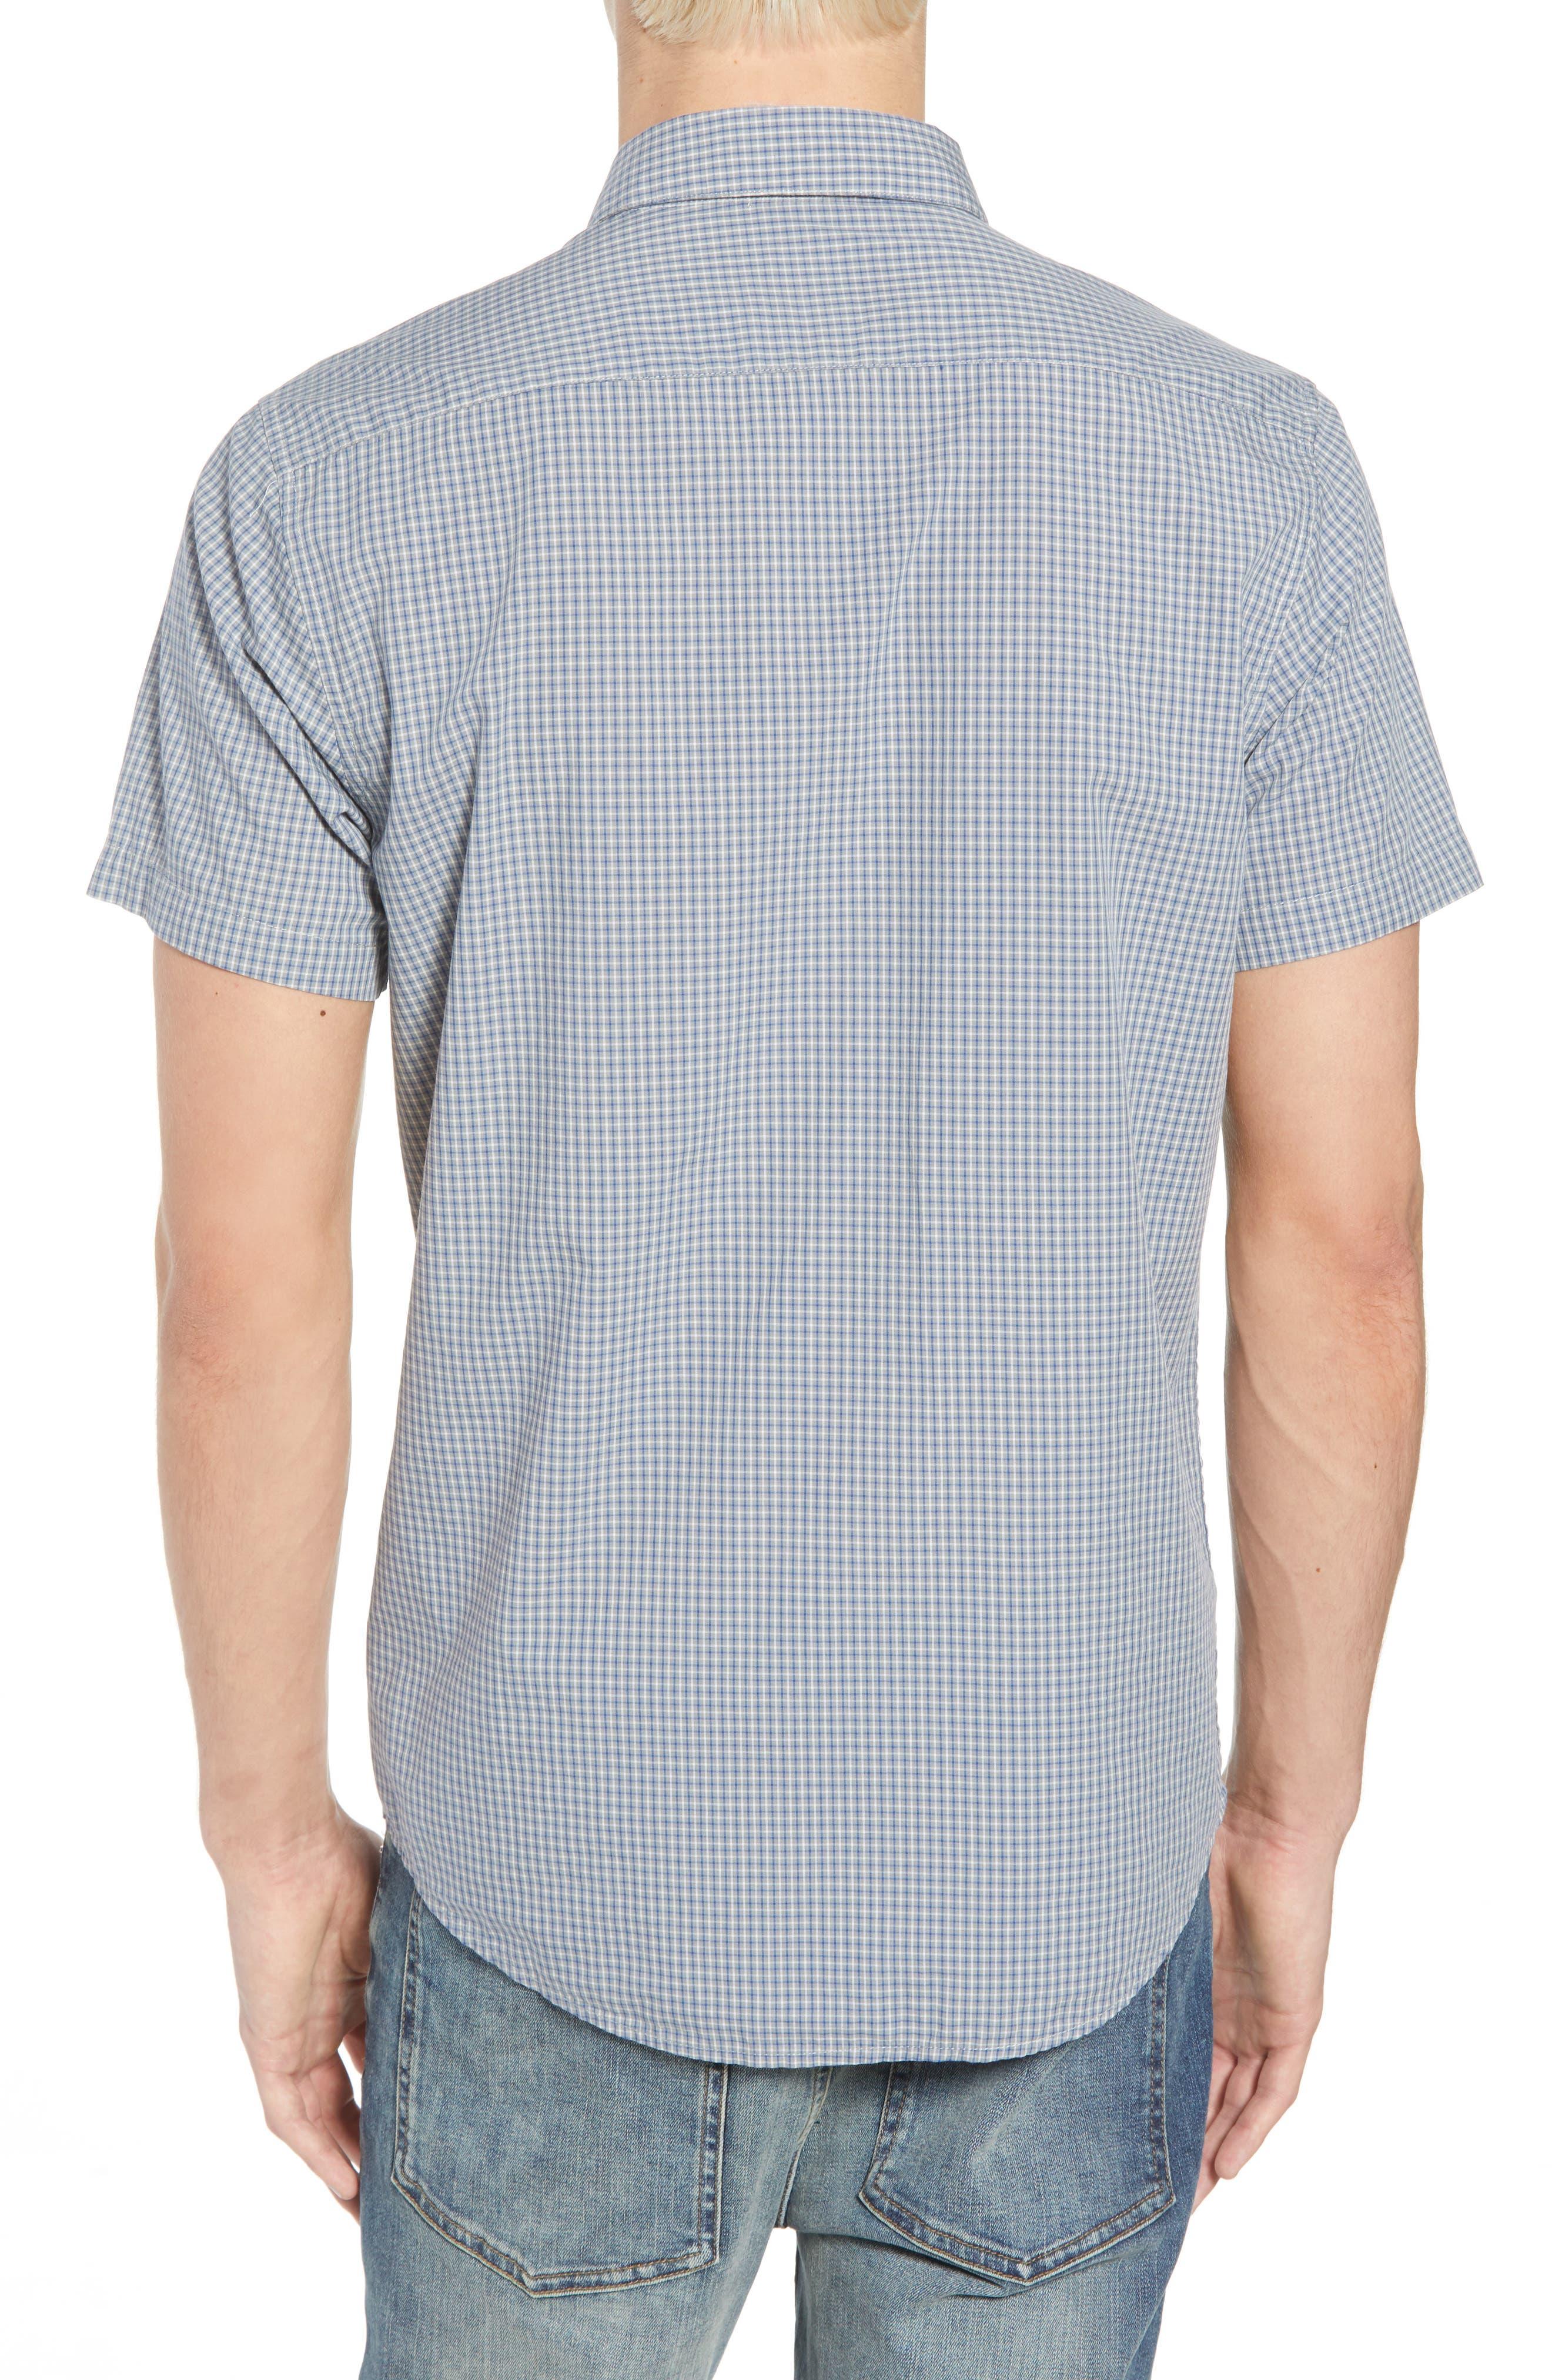 Staple Woven Shirt,                             Alternate thumbnail 2, color,                             026